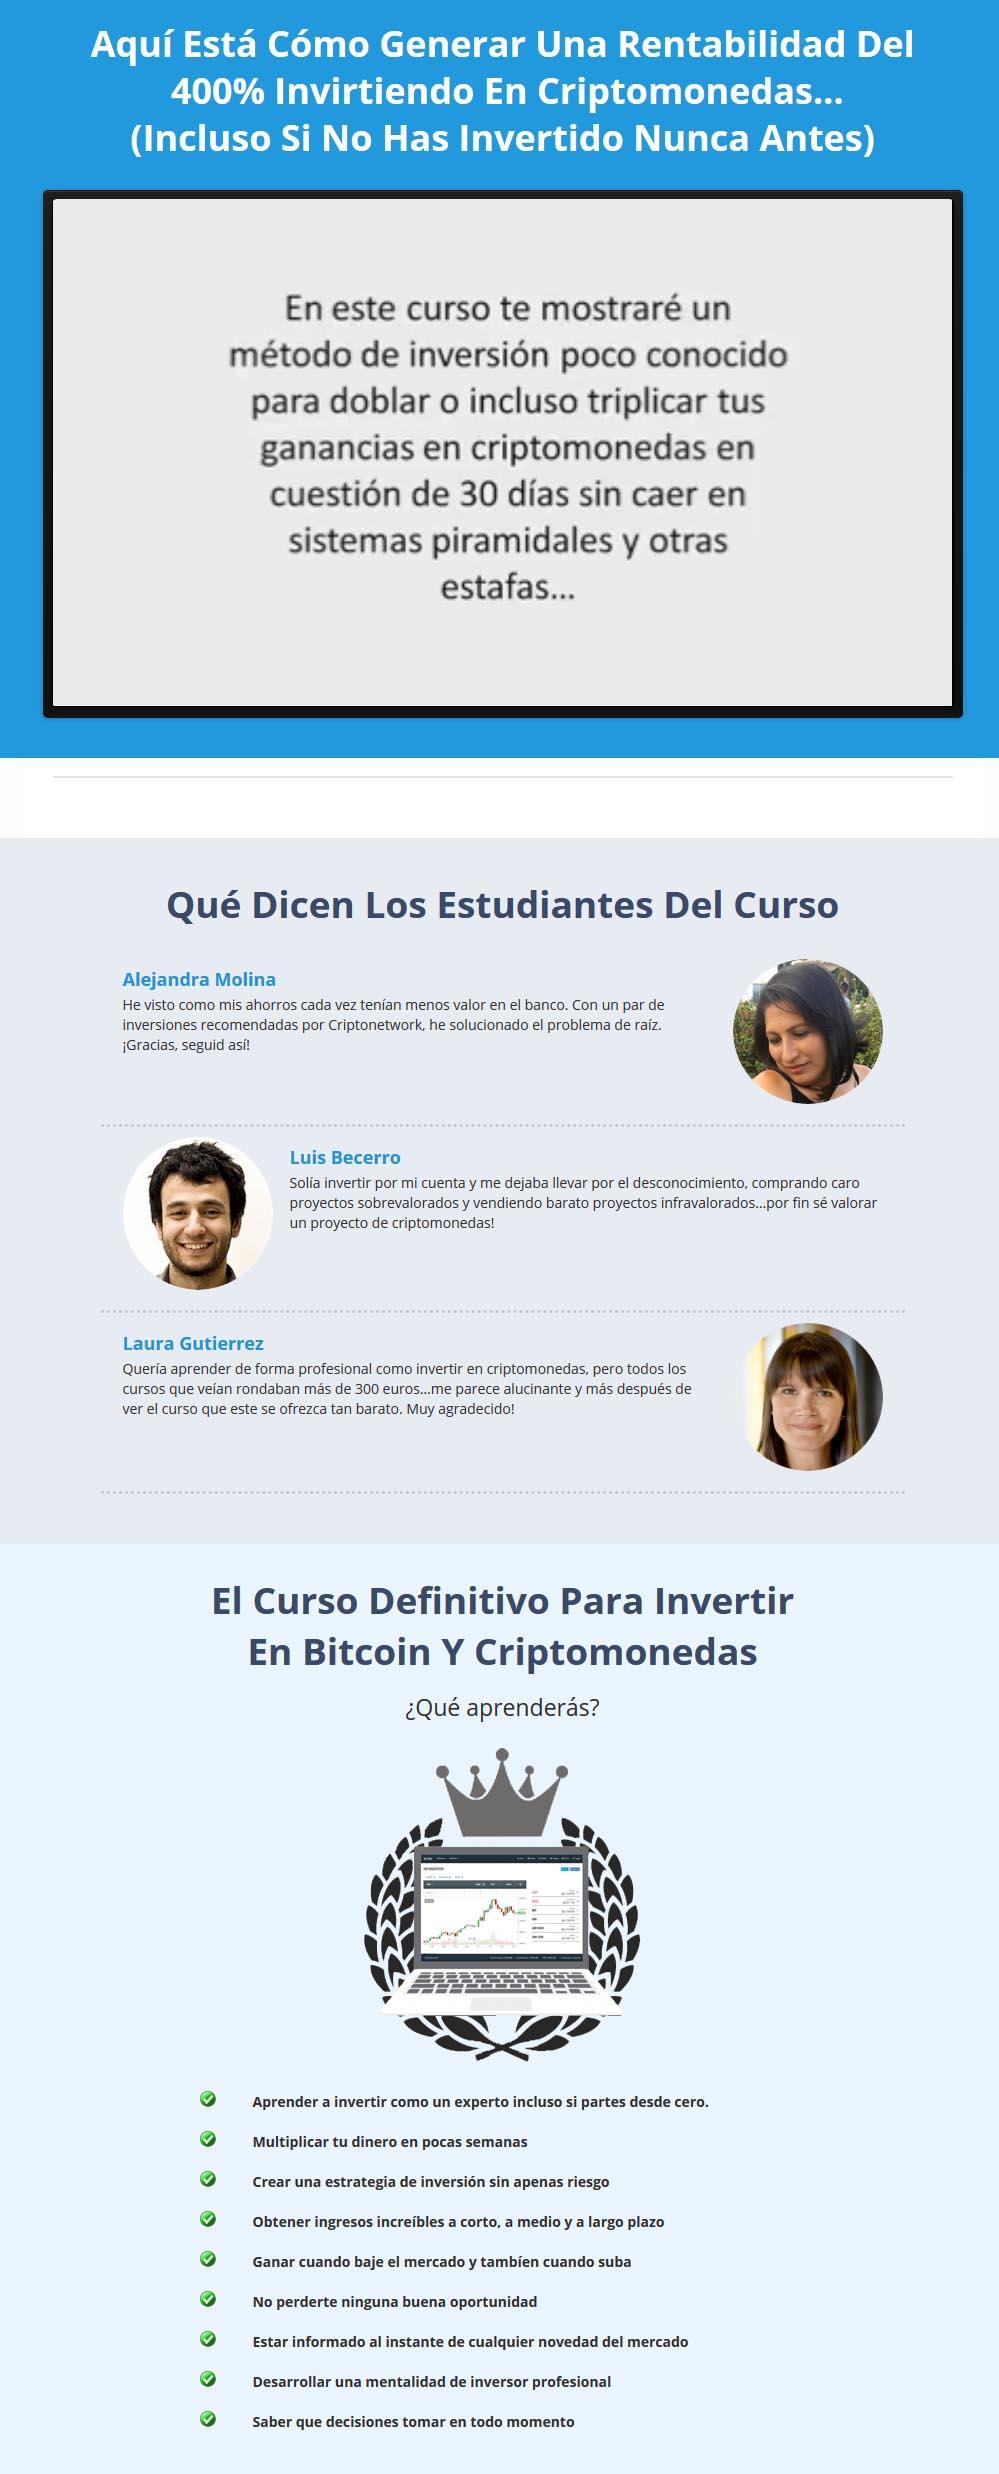 Curso Definitivo Para Invertir en Bitcoin y Criptomonedas